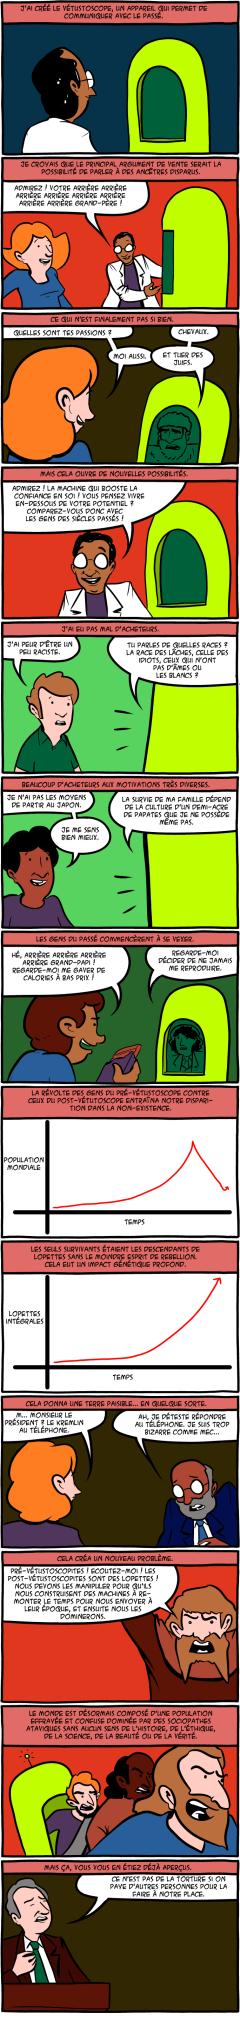 le vétustoscope